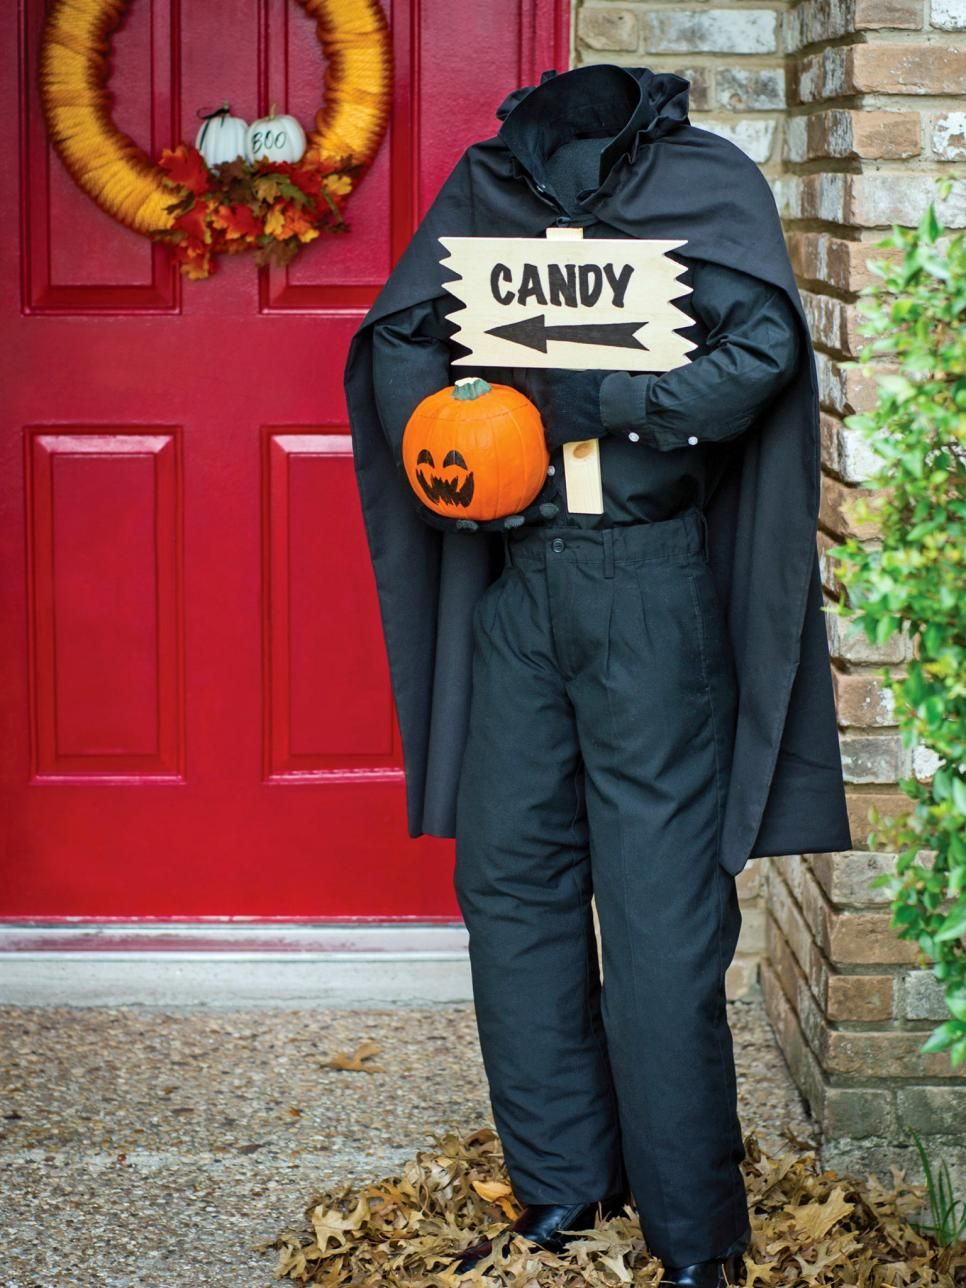 65 diy halloween decorations u0026 decorating ideas easy crafts and homemade decorating u0026 gift ideas